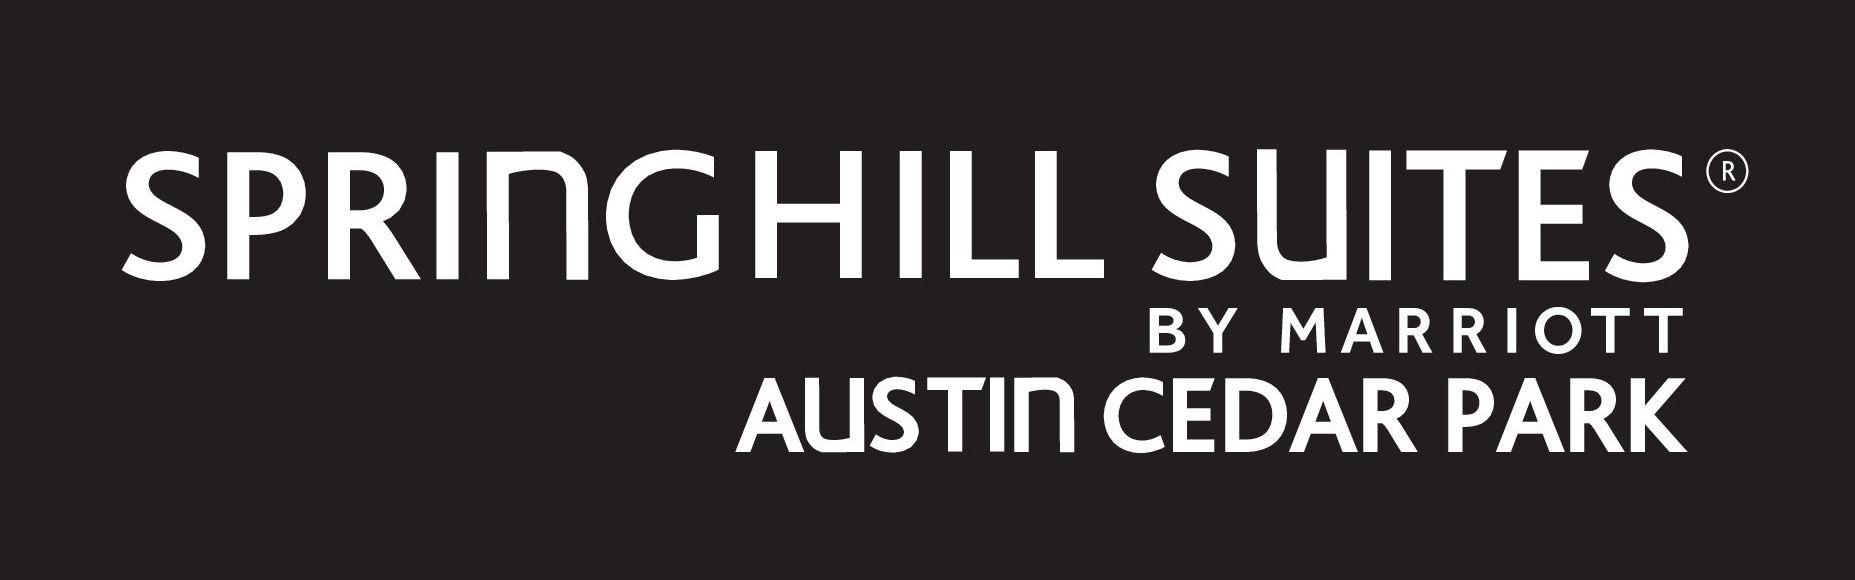 Springhill-Suites-ACP